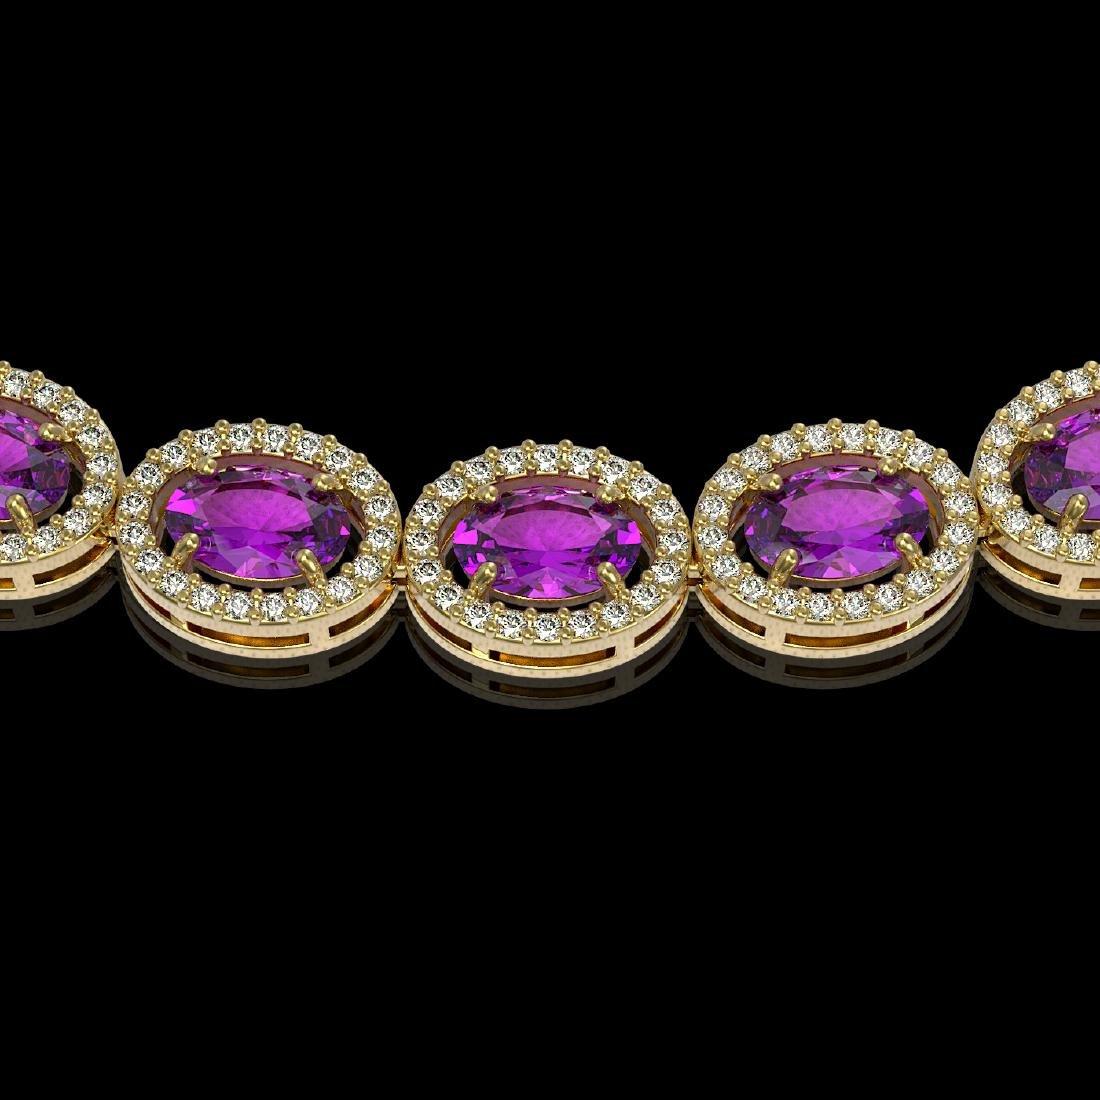 29.38 CTW Amethyst & Diamond Halo Necklace 10K Yellow - 3